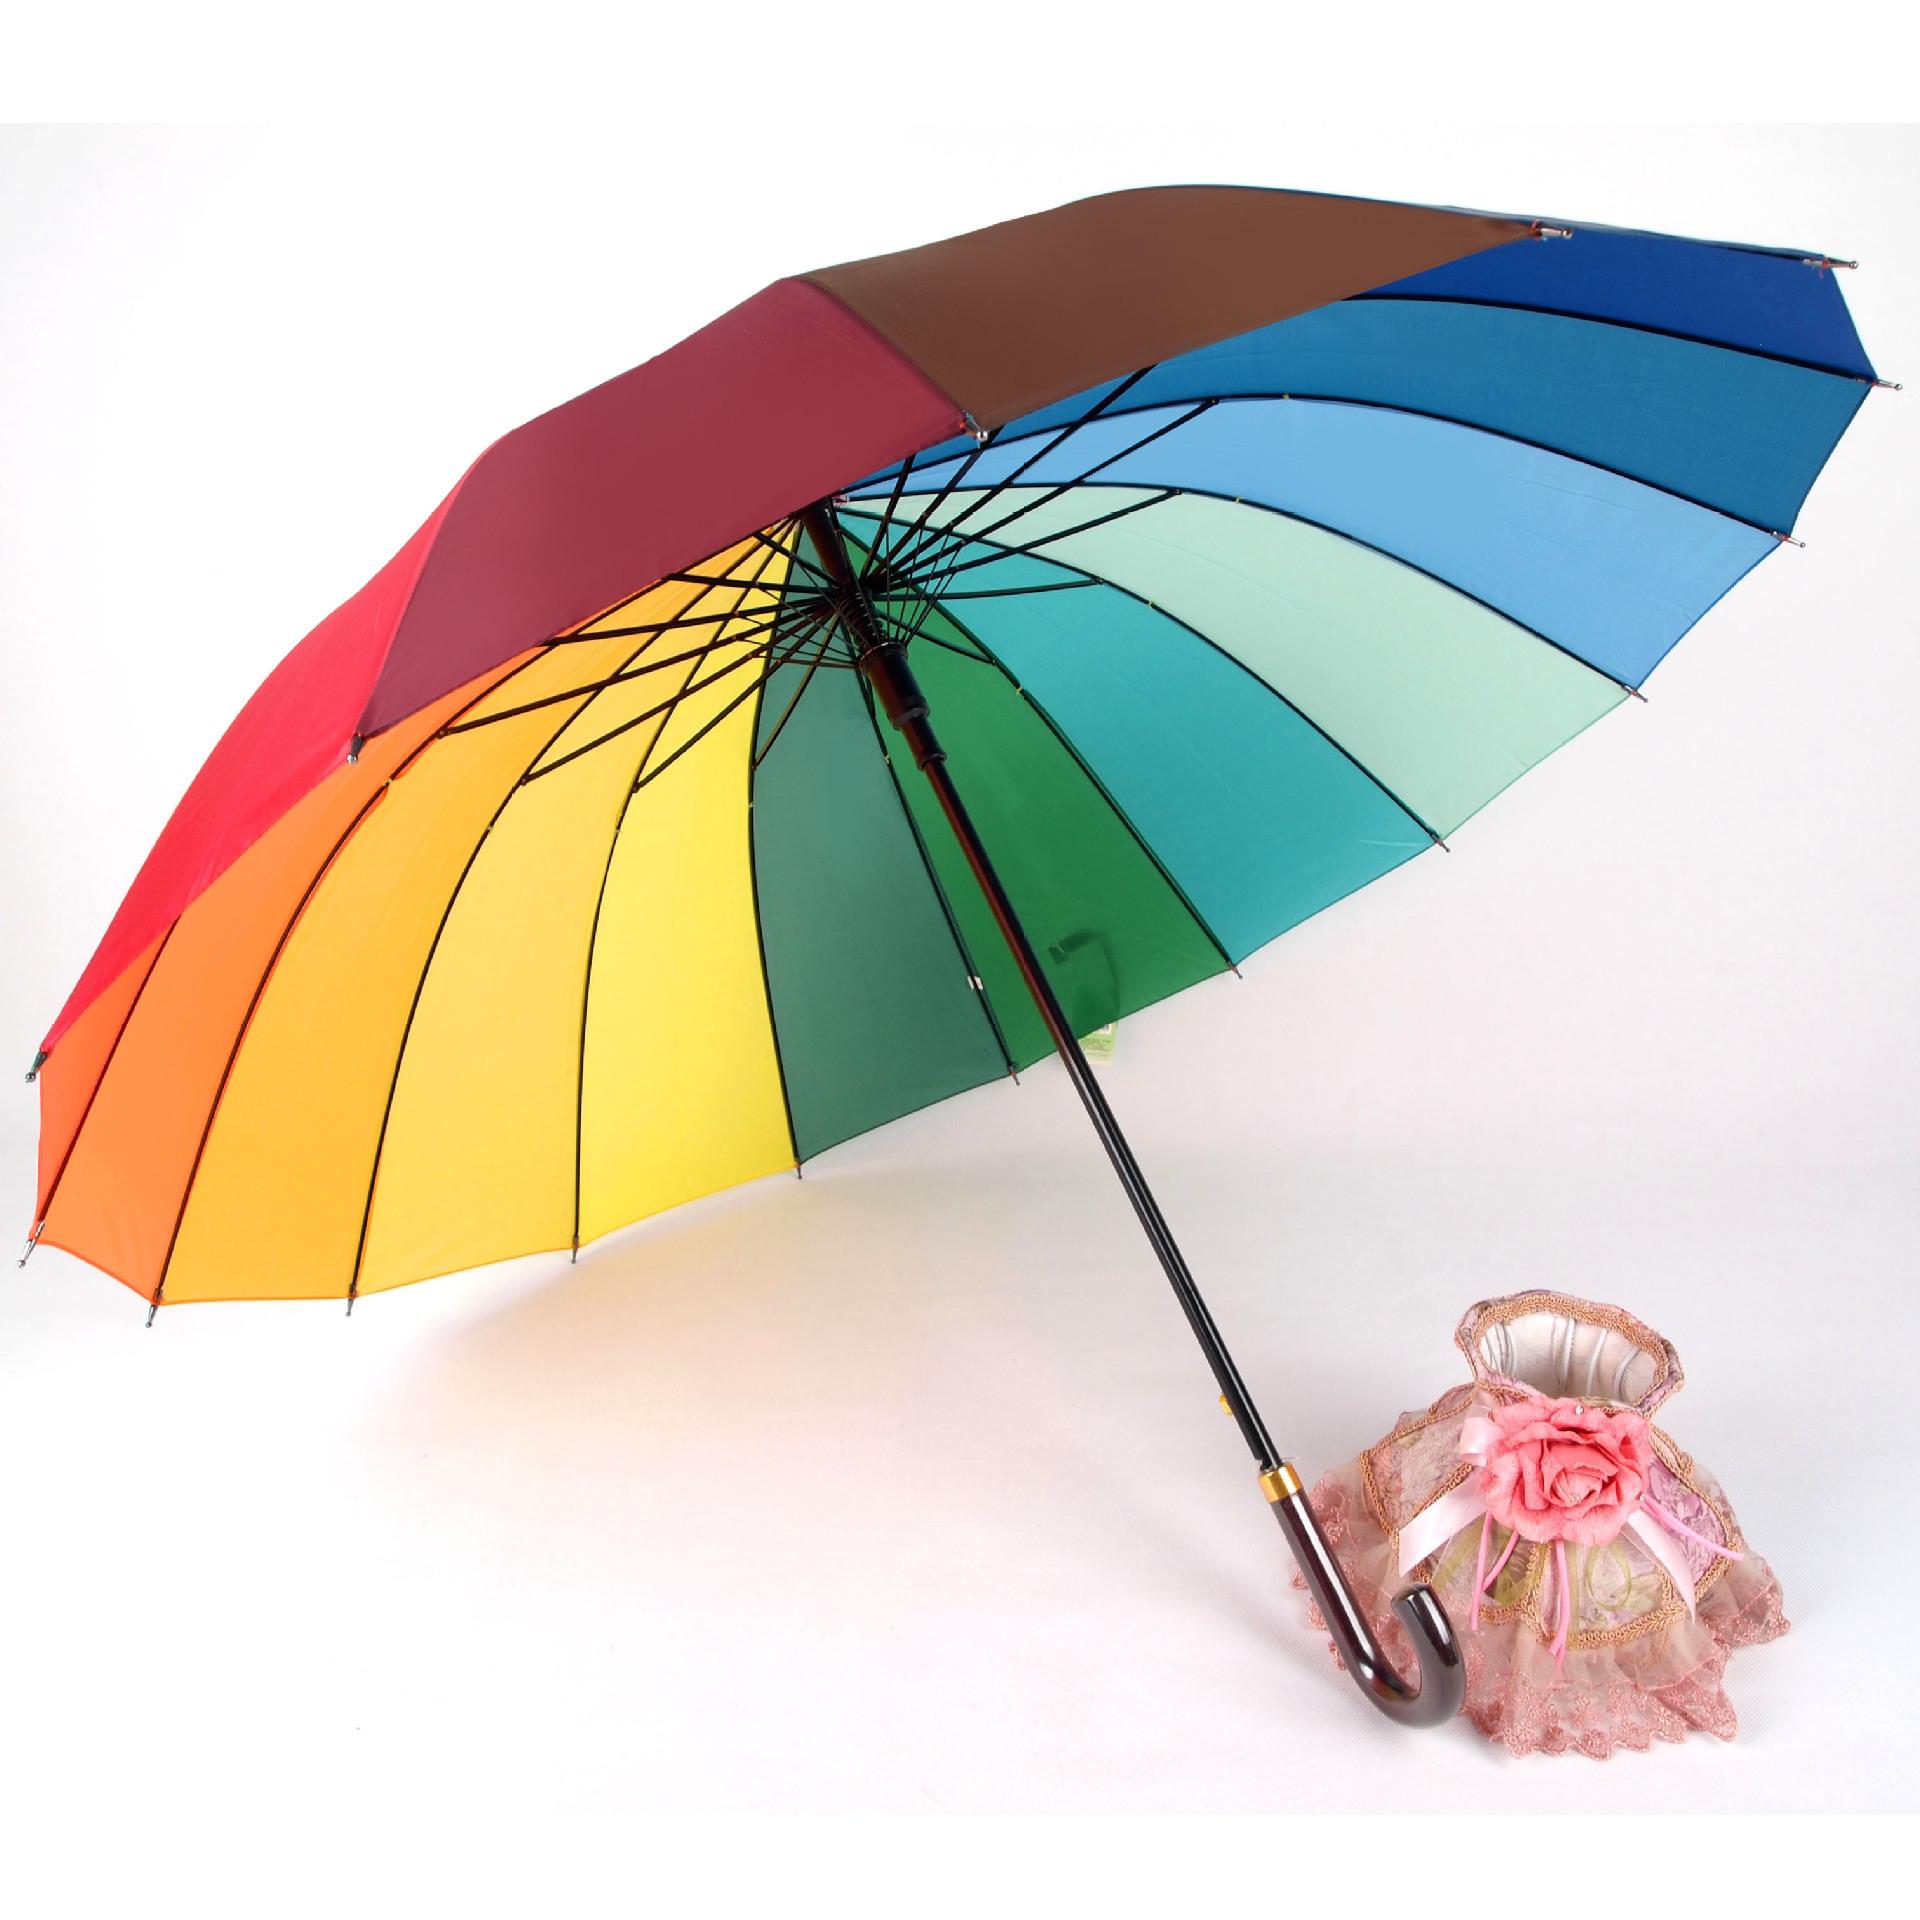 Aurora Creative Umbrella 138 UV-Protection 16K Gradient South Korea Large Rainbow Umbrella Straight Handle Advertising Umbrella